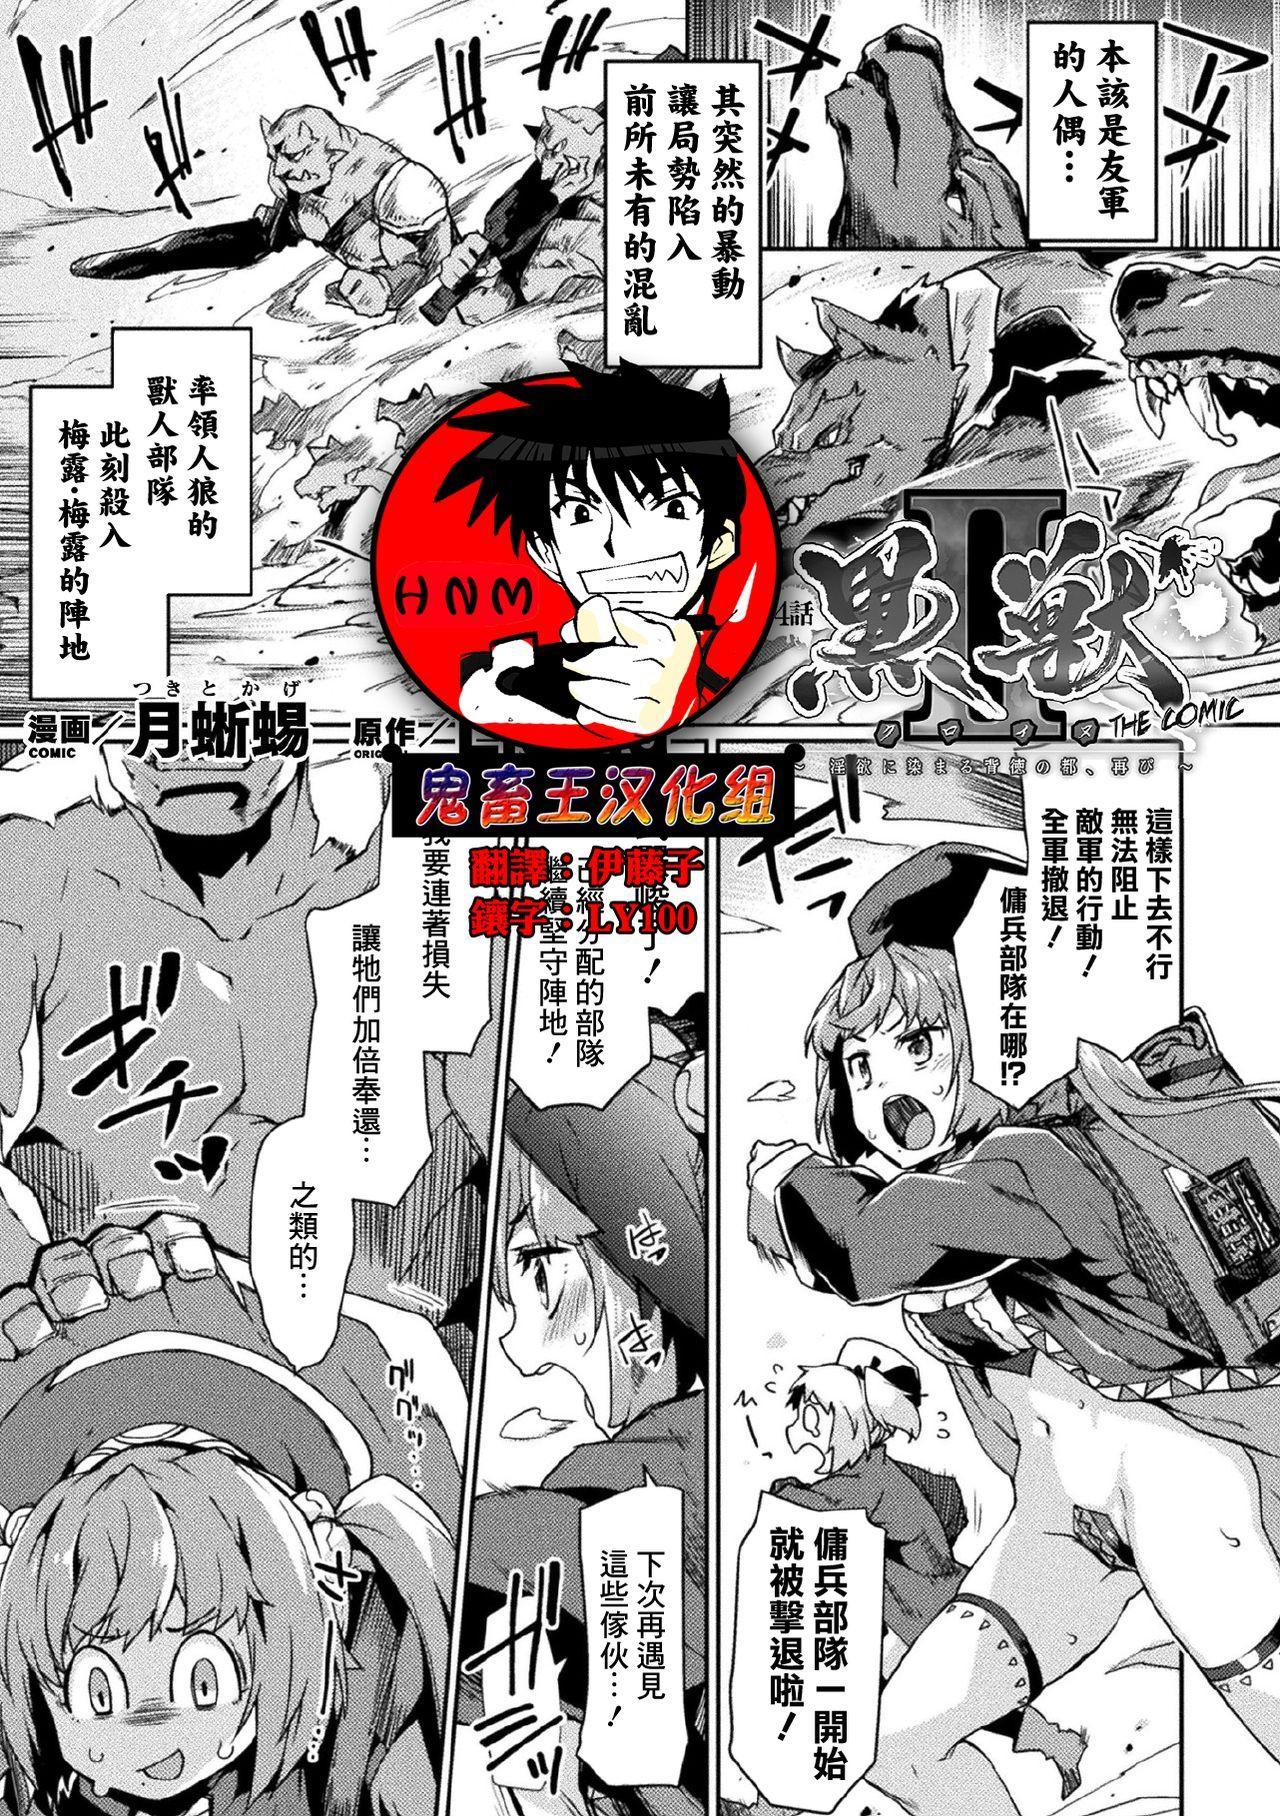 [Tsukitokage] Kuroinu II ~Inyoku ni Somaru Haitoku no Miyako, Futatabi~ THE COMIC Ch. 4 (Kukkoro Heroines Vol. 3) [Chinese] [鬼畜王漢化組] [Digital] 0